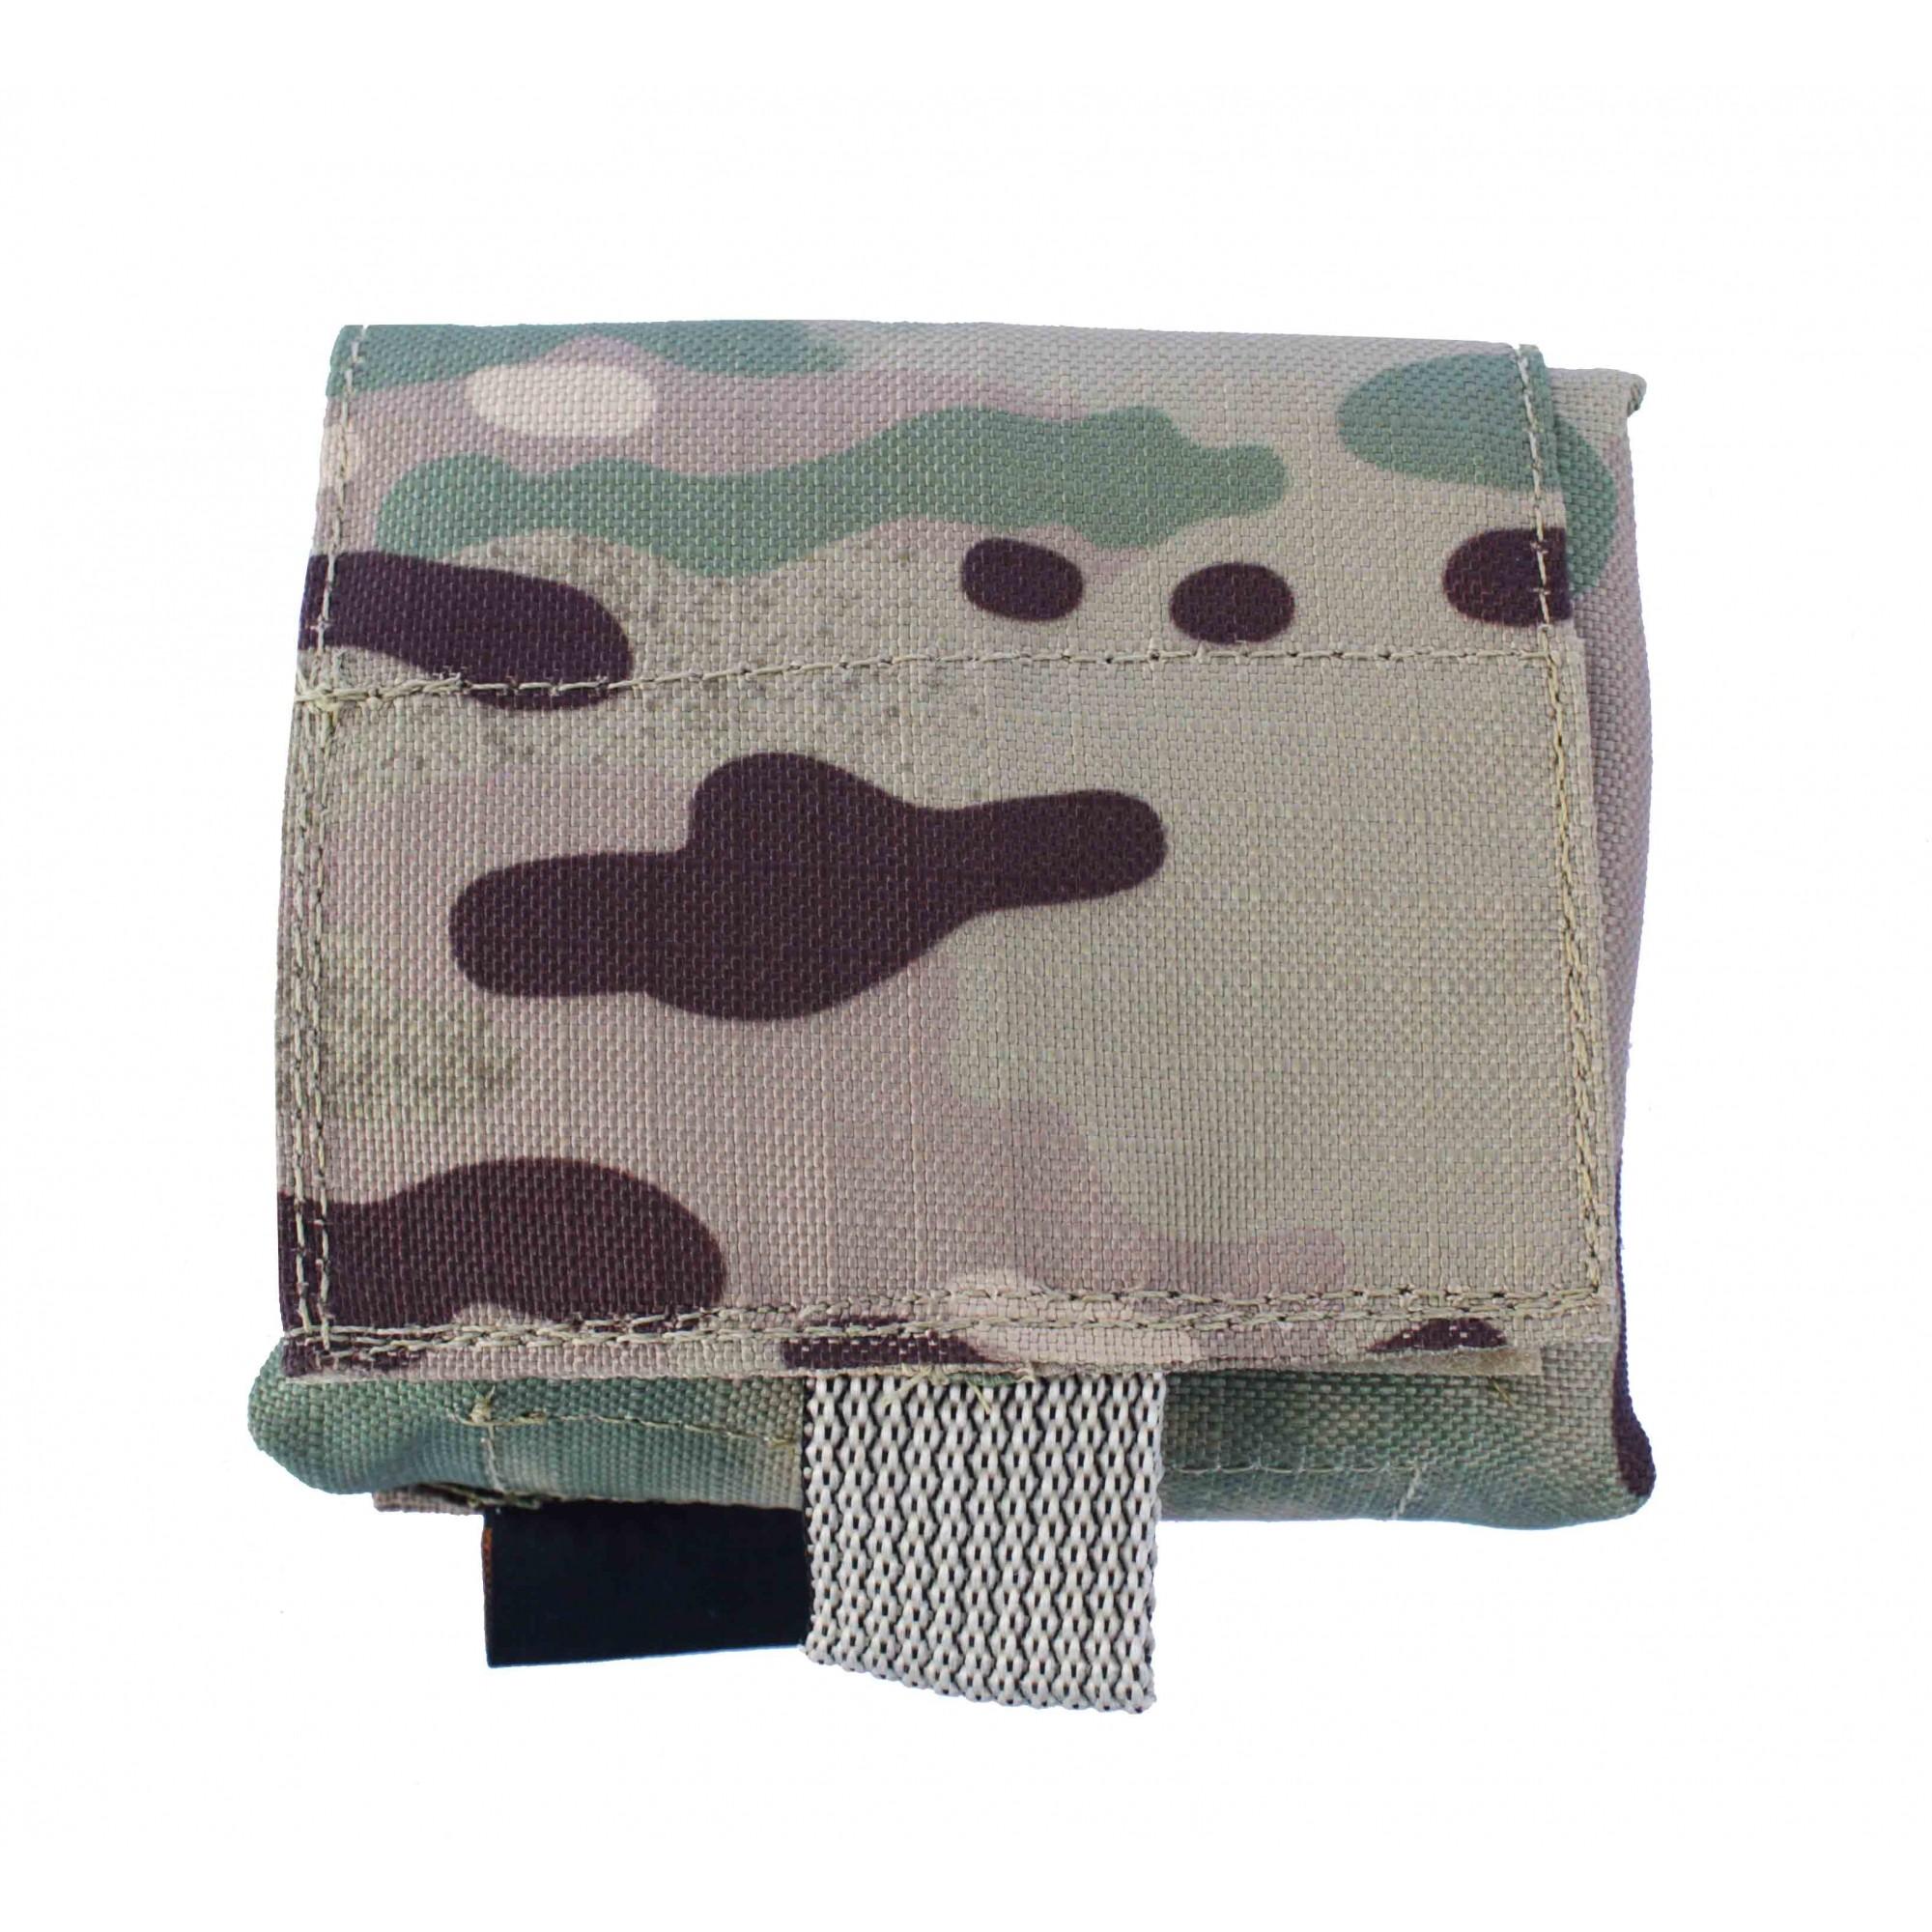 Drop Pouch (Dispenser de Mag) Modular para Colete - Multicam